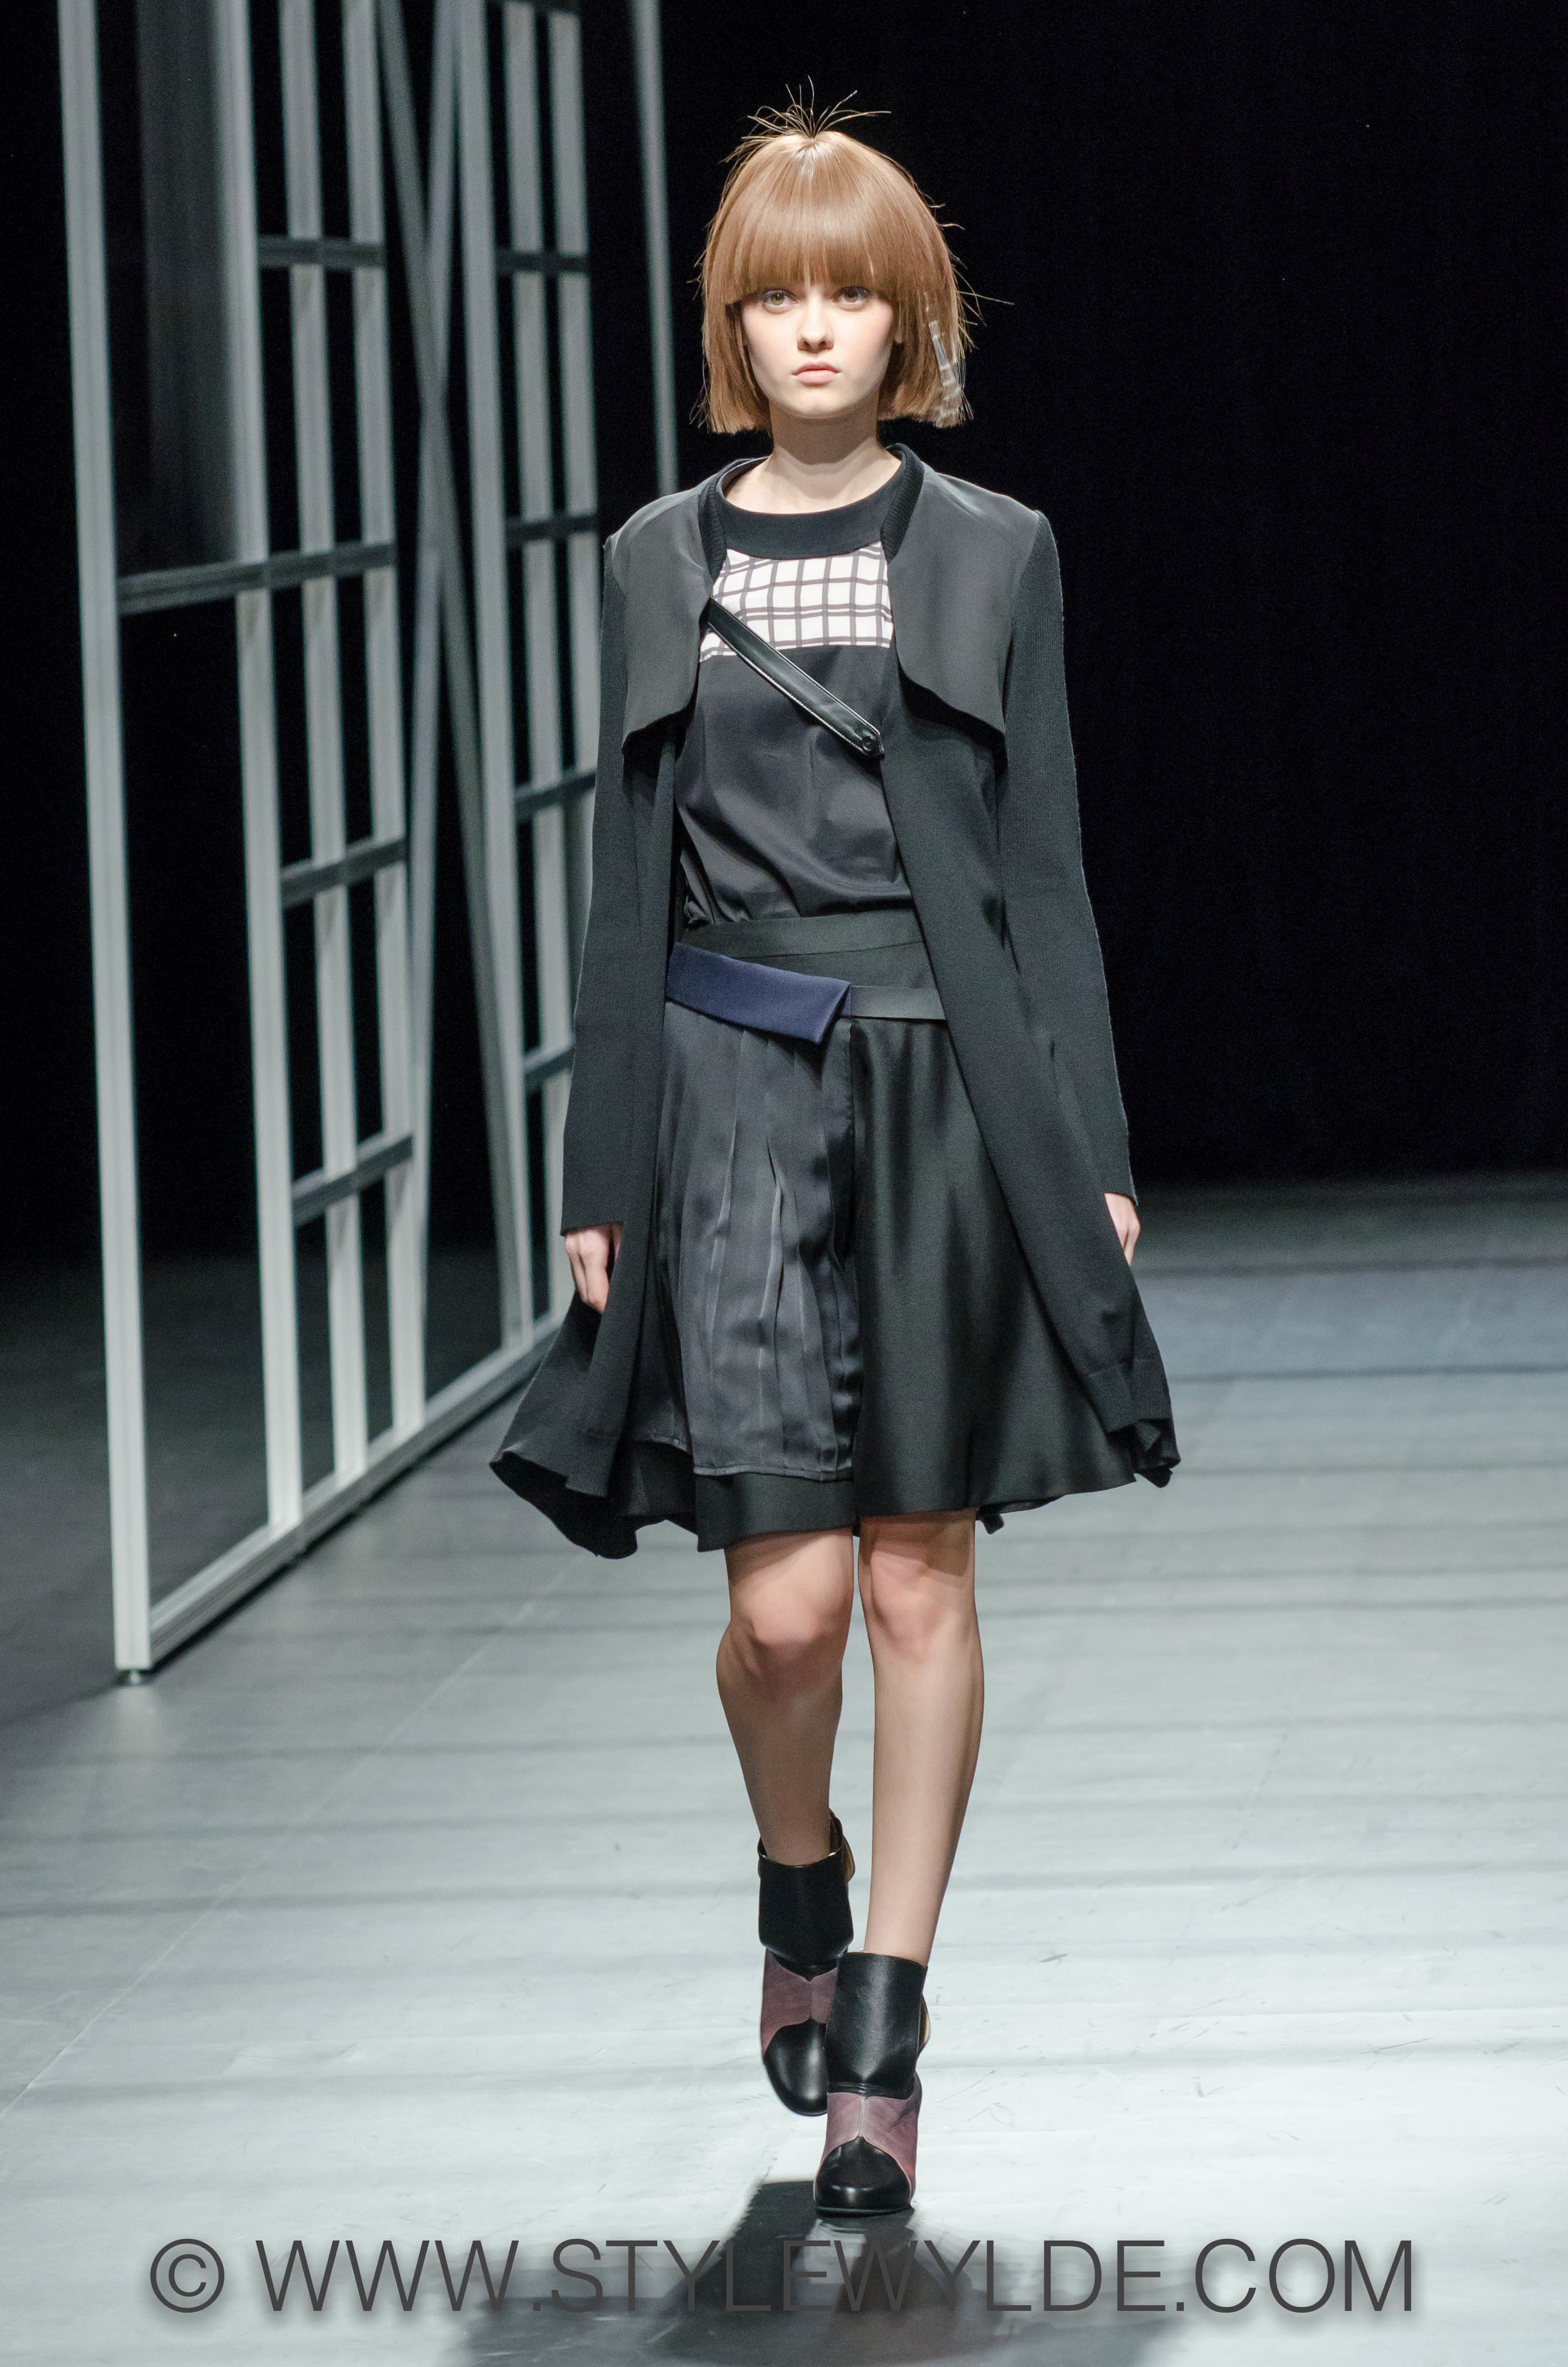 StyleWylde_YasutoshiEzumi_AW14_story (1 of 1)-14.jpg